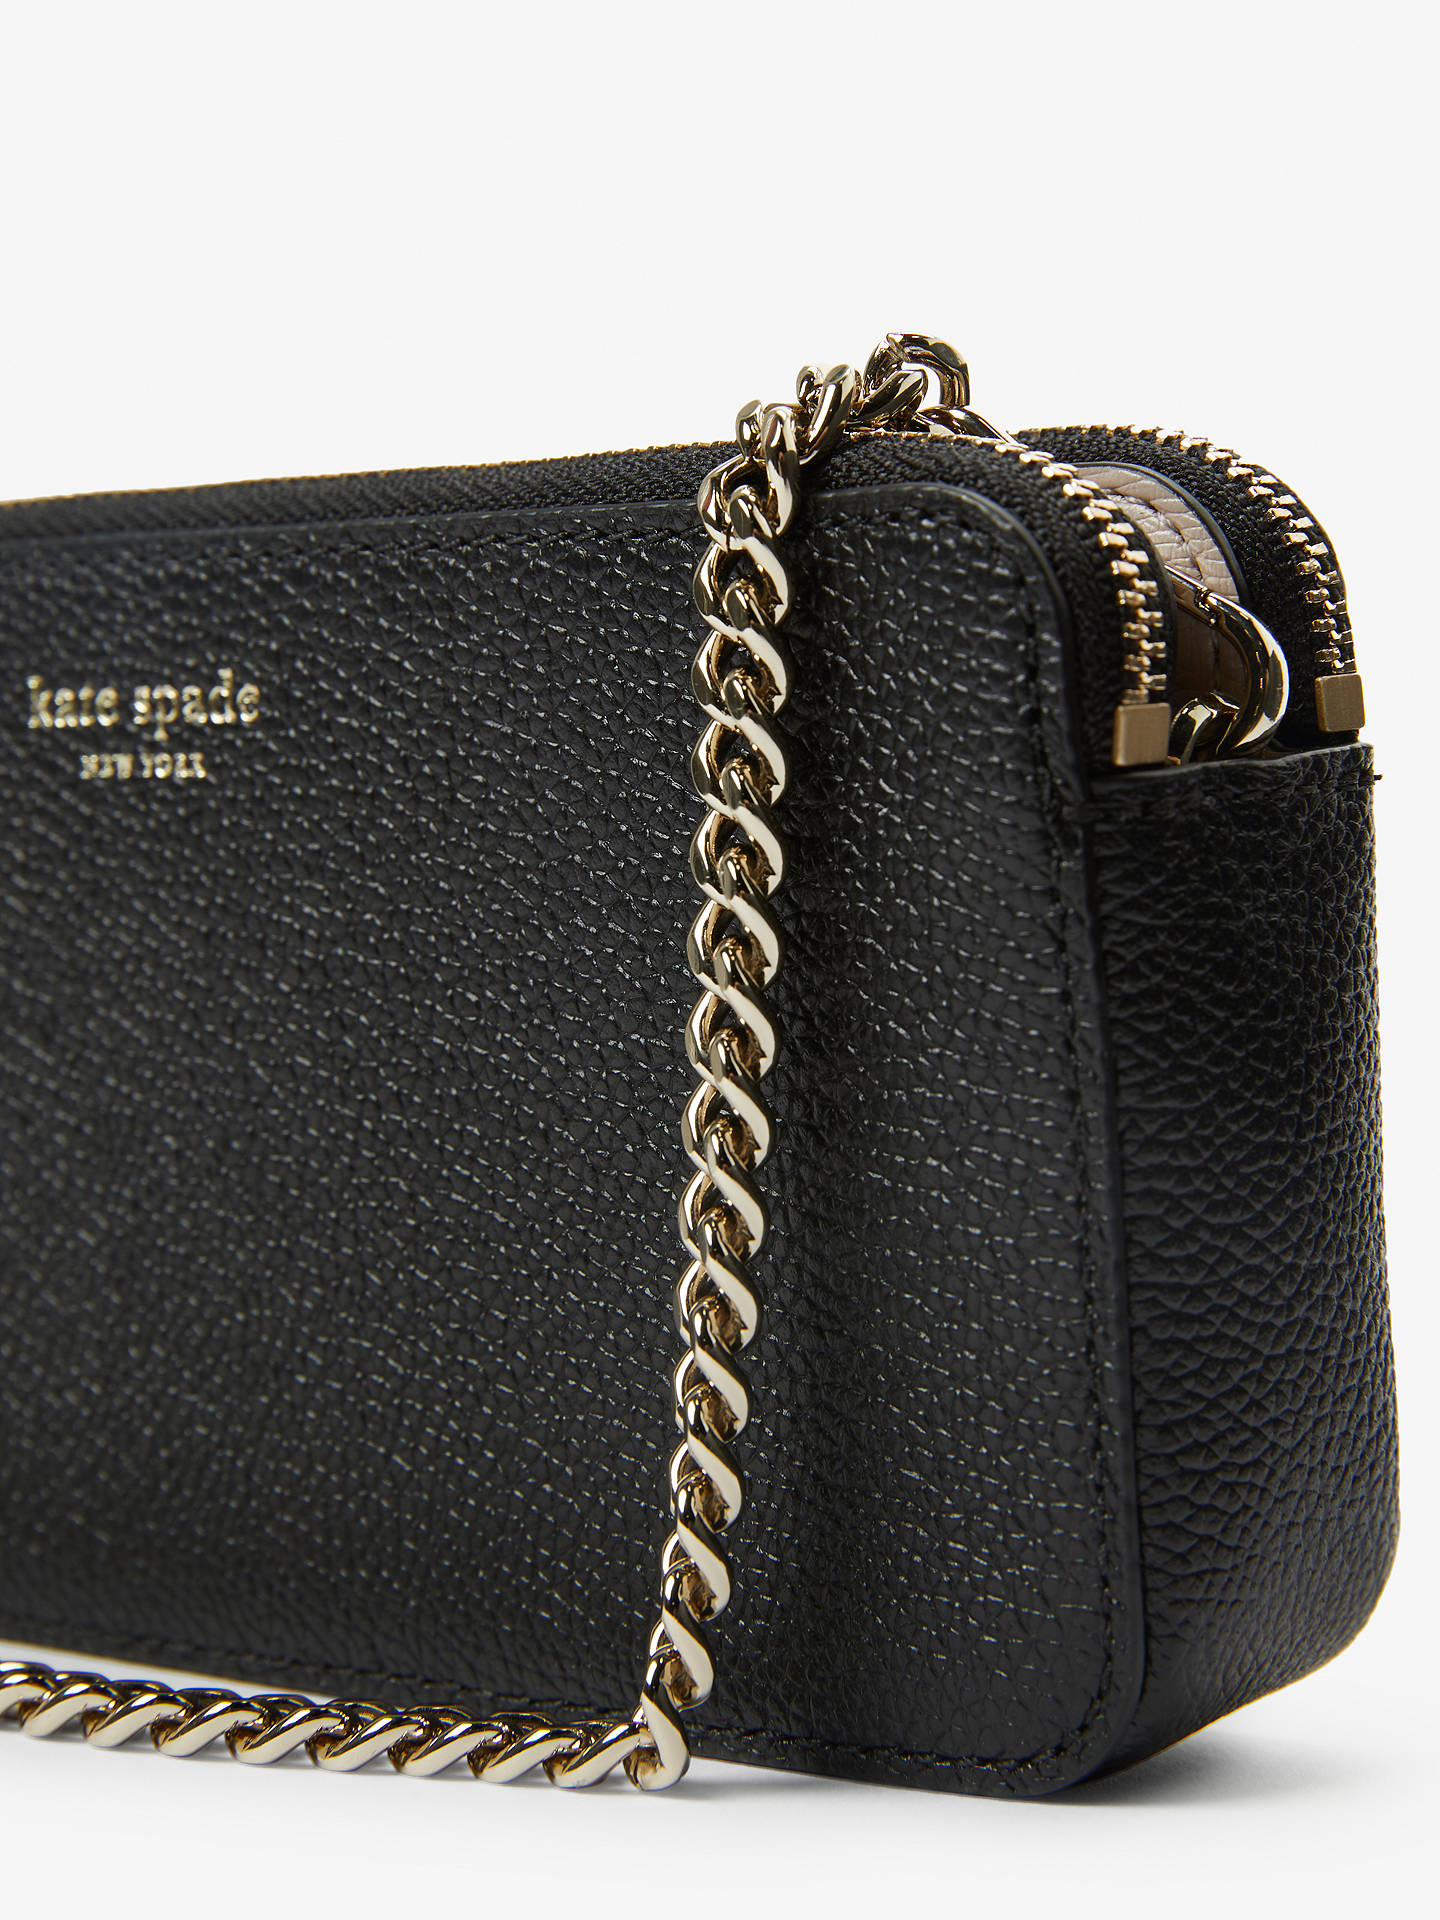 e592ffc88 ... Buy kate spade new york Margaux Leather Double Zip Mini Cross Body Bag,  Black Online